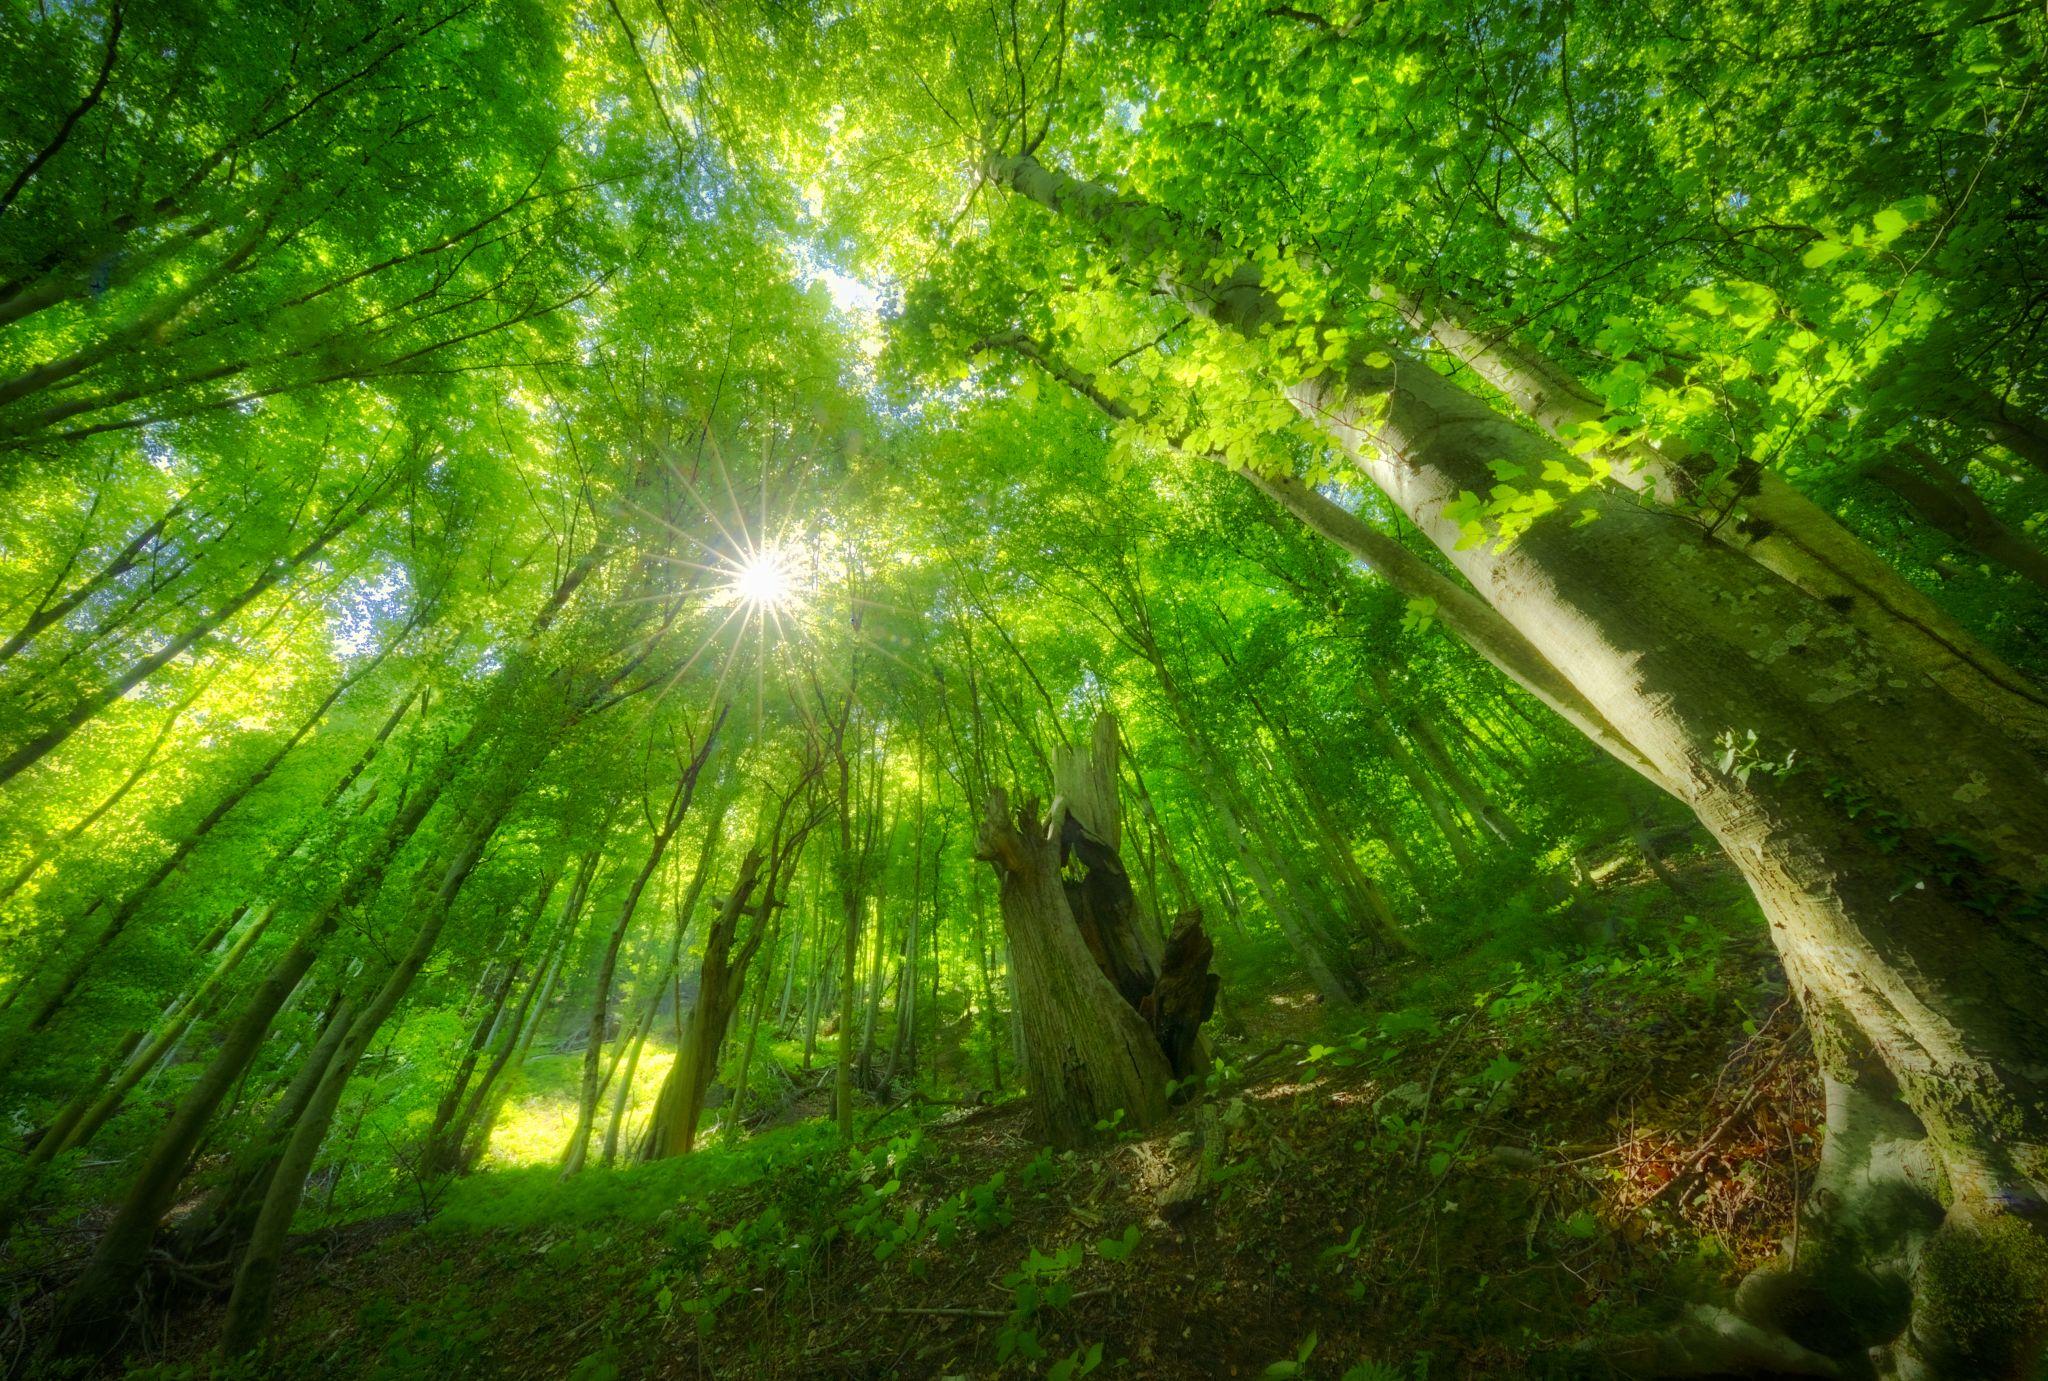 Magie im Wald, © Jörg Schmöe